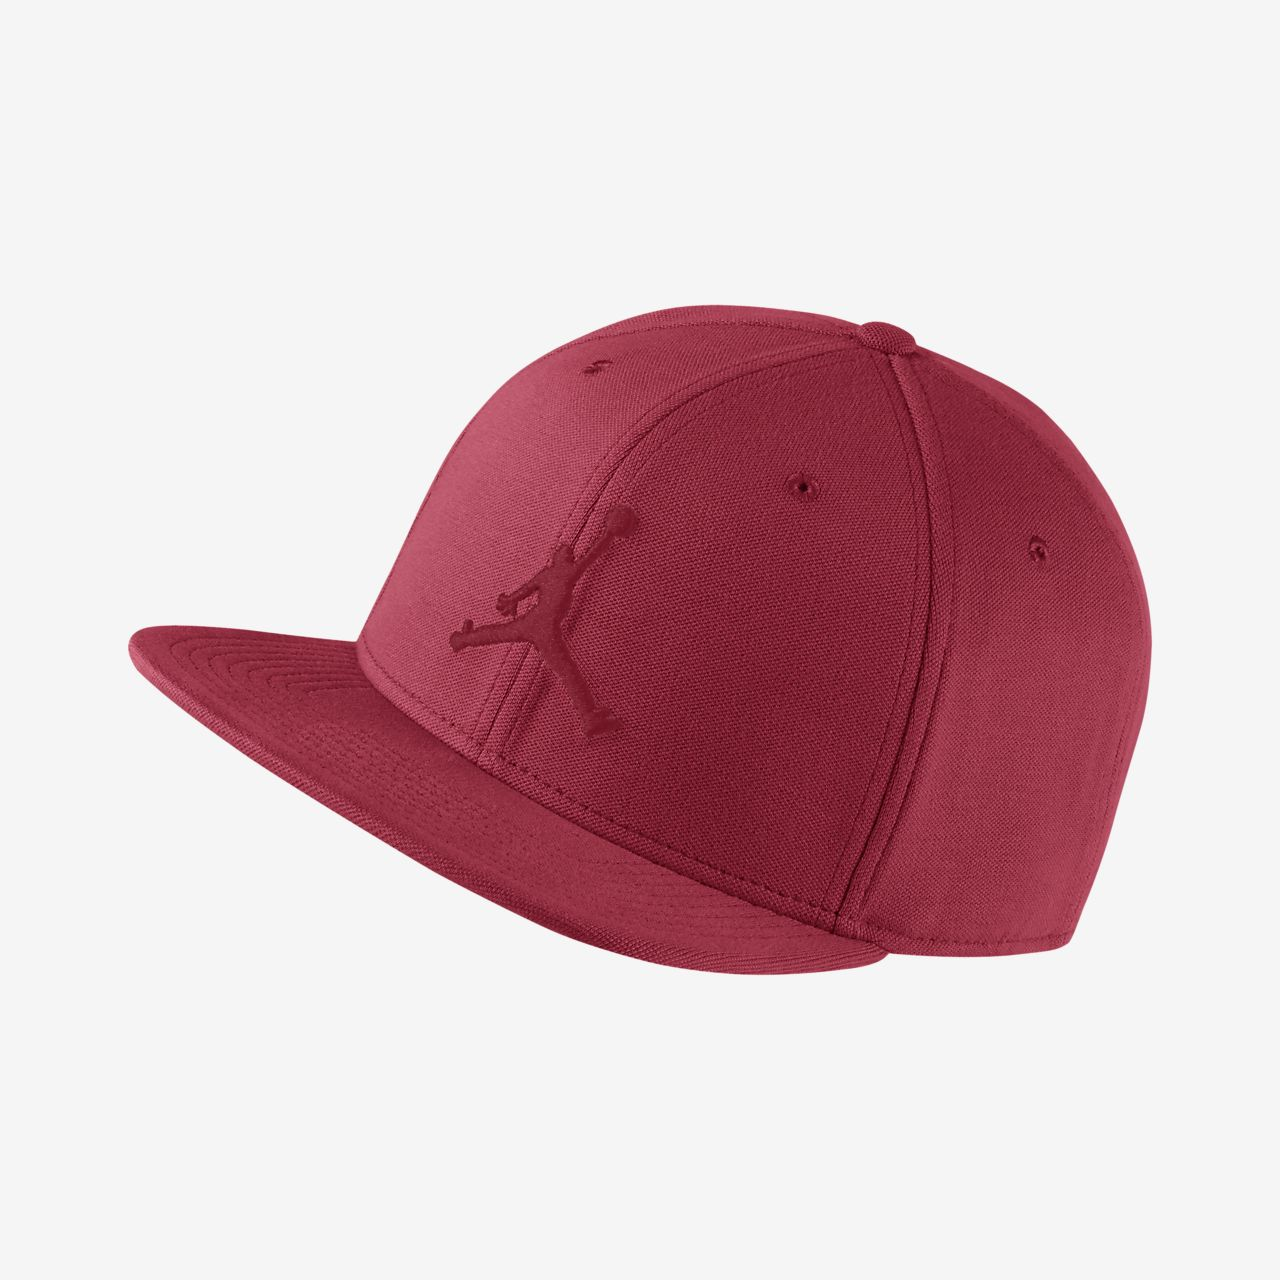 9b160daa342 Low Resolution Jordan Jumpman Snapback Adjustable Hat Jordan Jumpman  Snapback Adjustable Hat